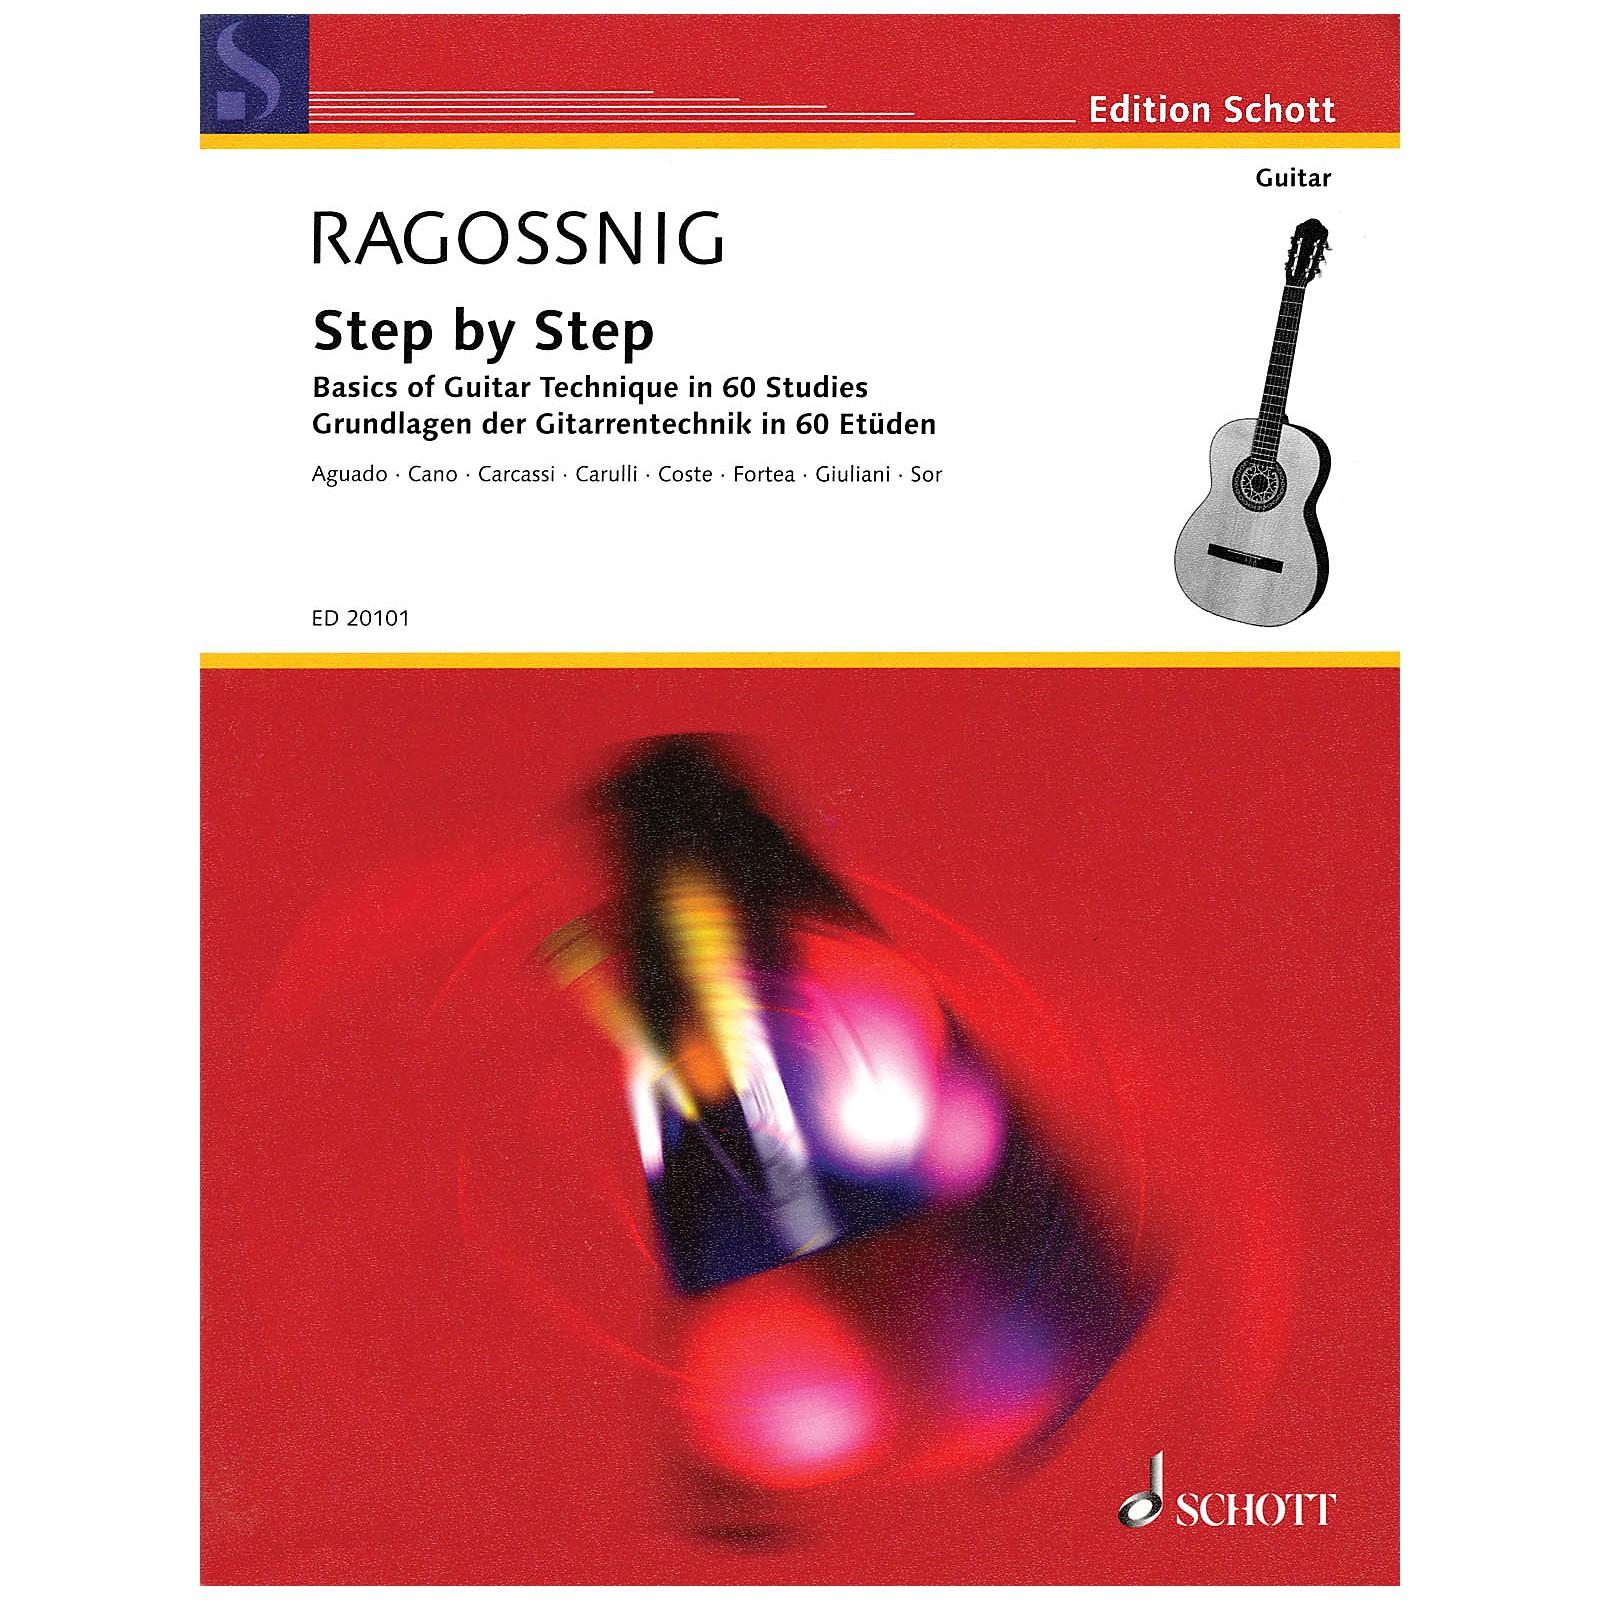 Schott Step by Step (Basics of Guitar Technique in 60 Studies) Guitar Series